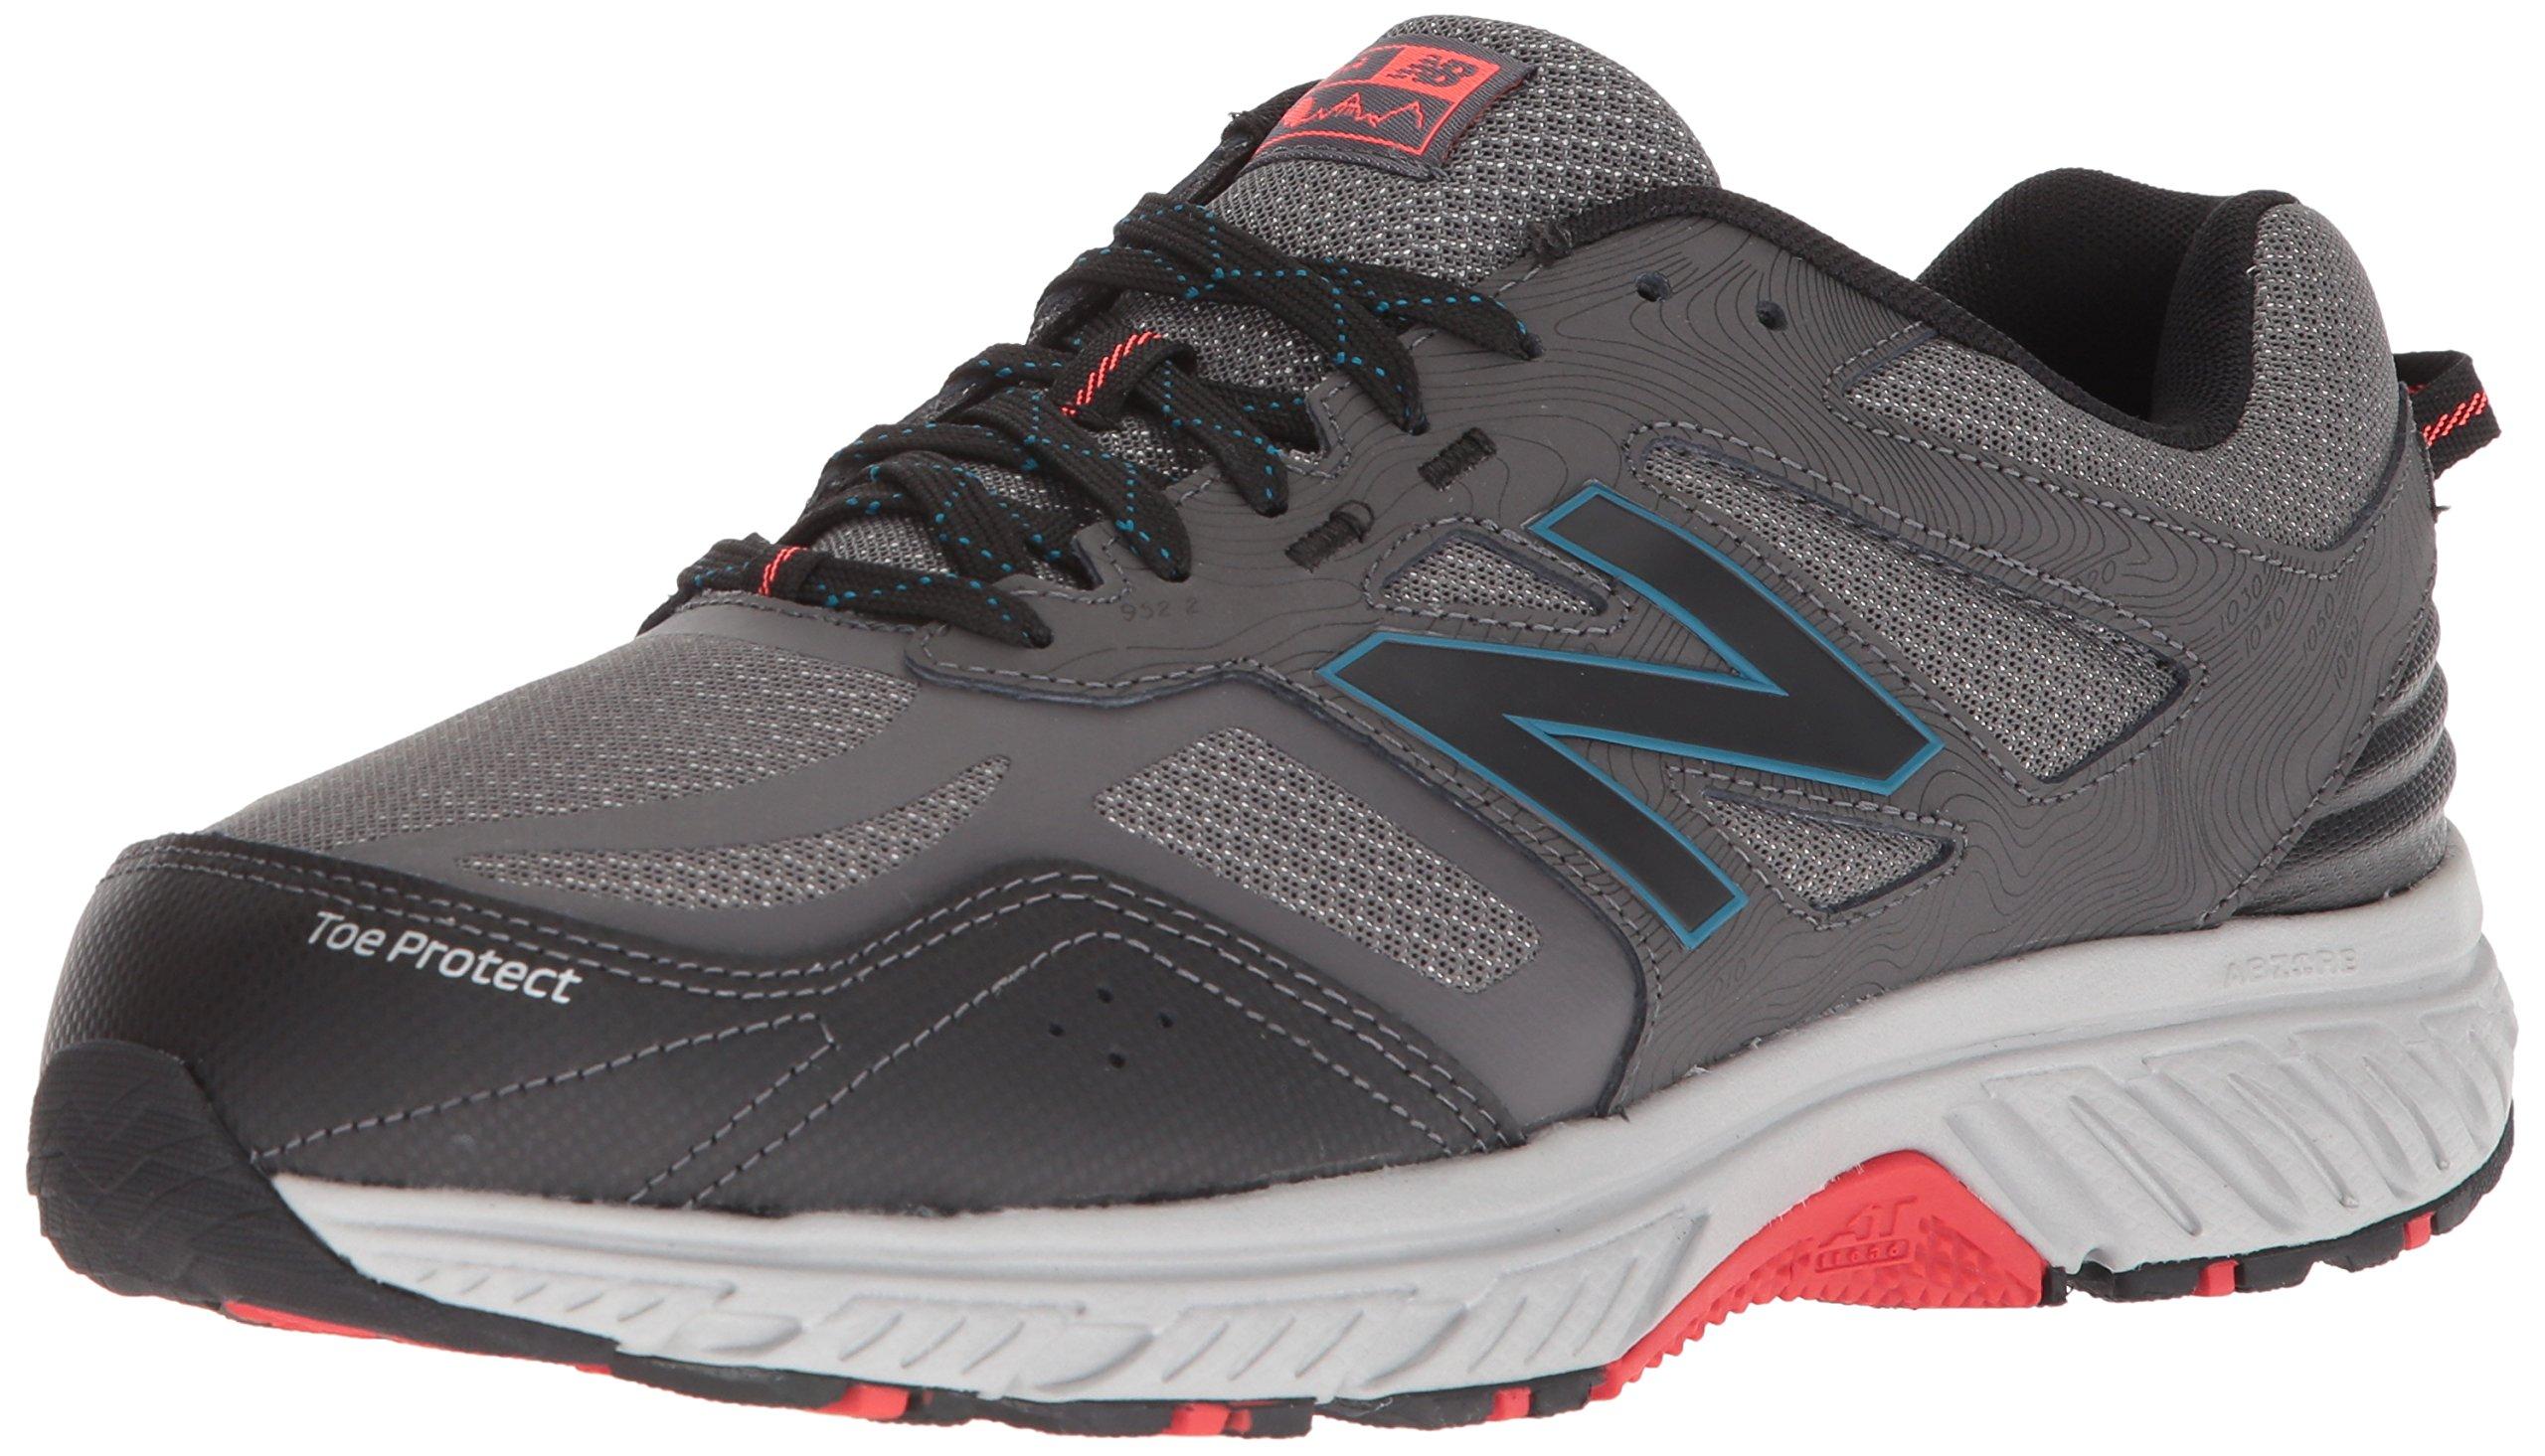 New Balance Men's 510v4 Cushioning Trail Running Shoe, Magnet, 7 D US by New Balance (Image #1)